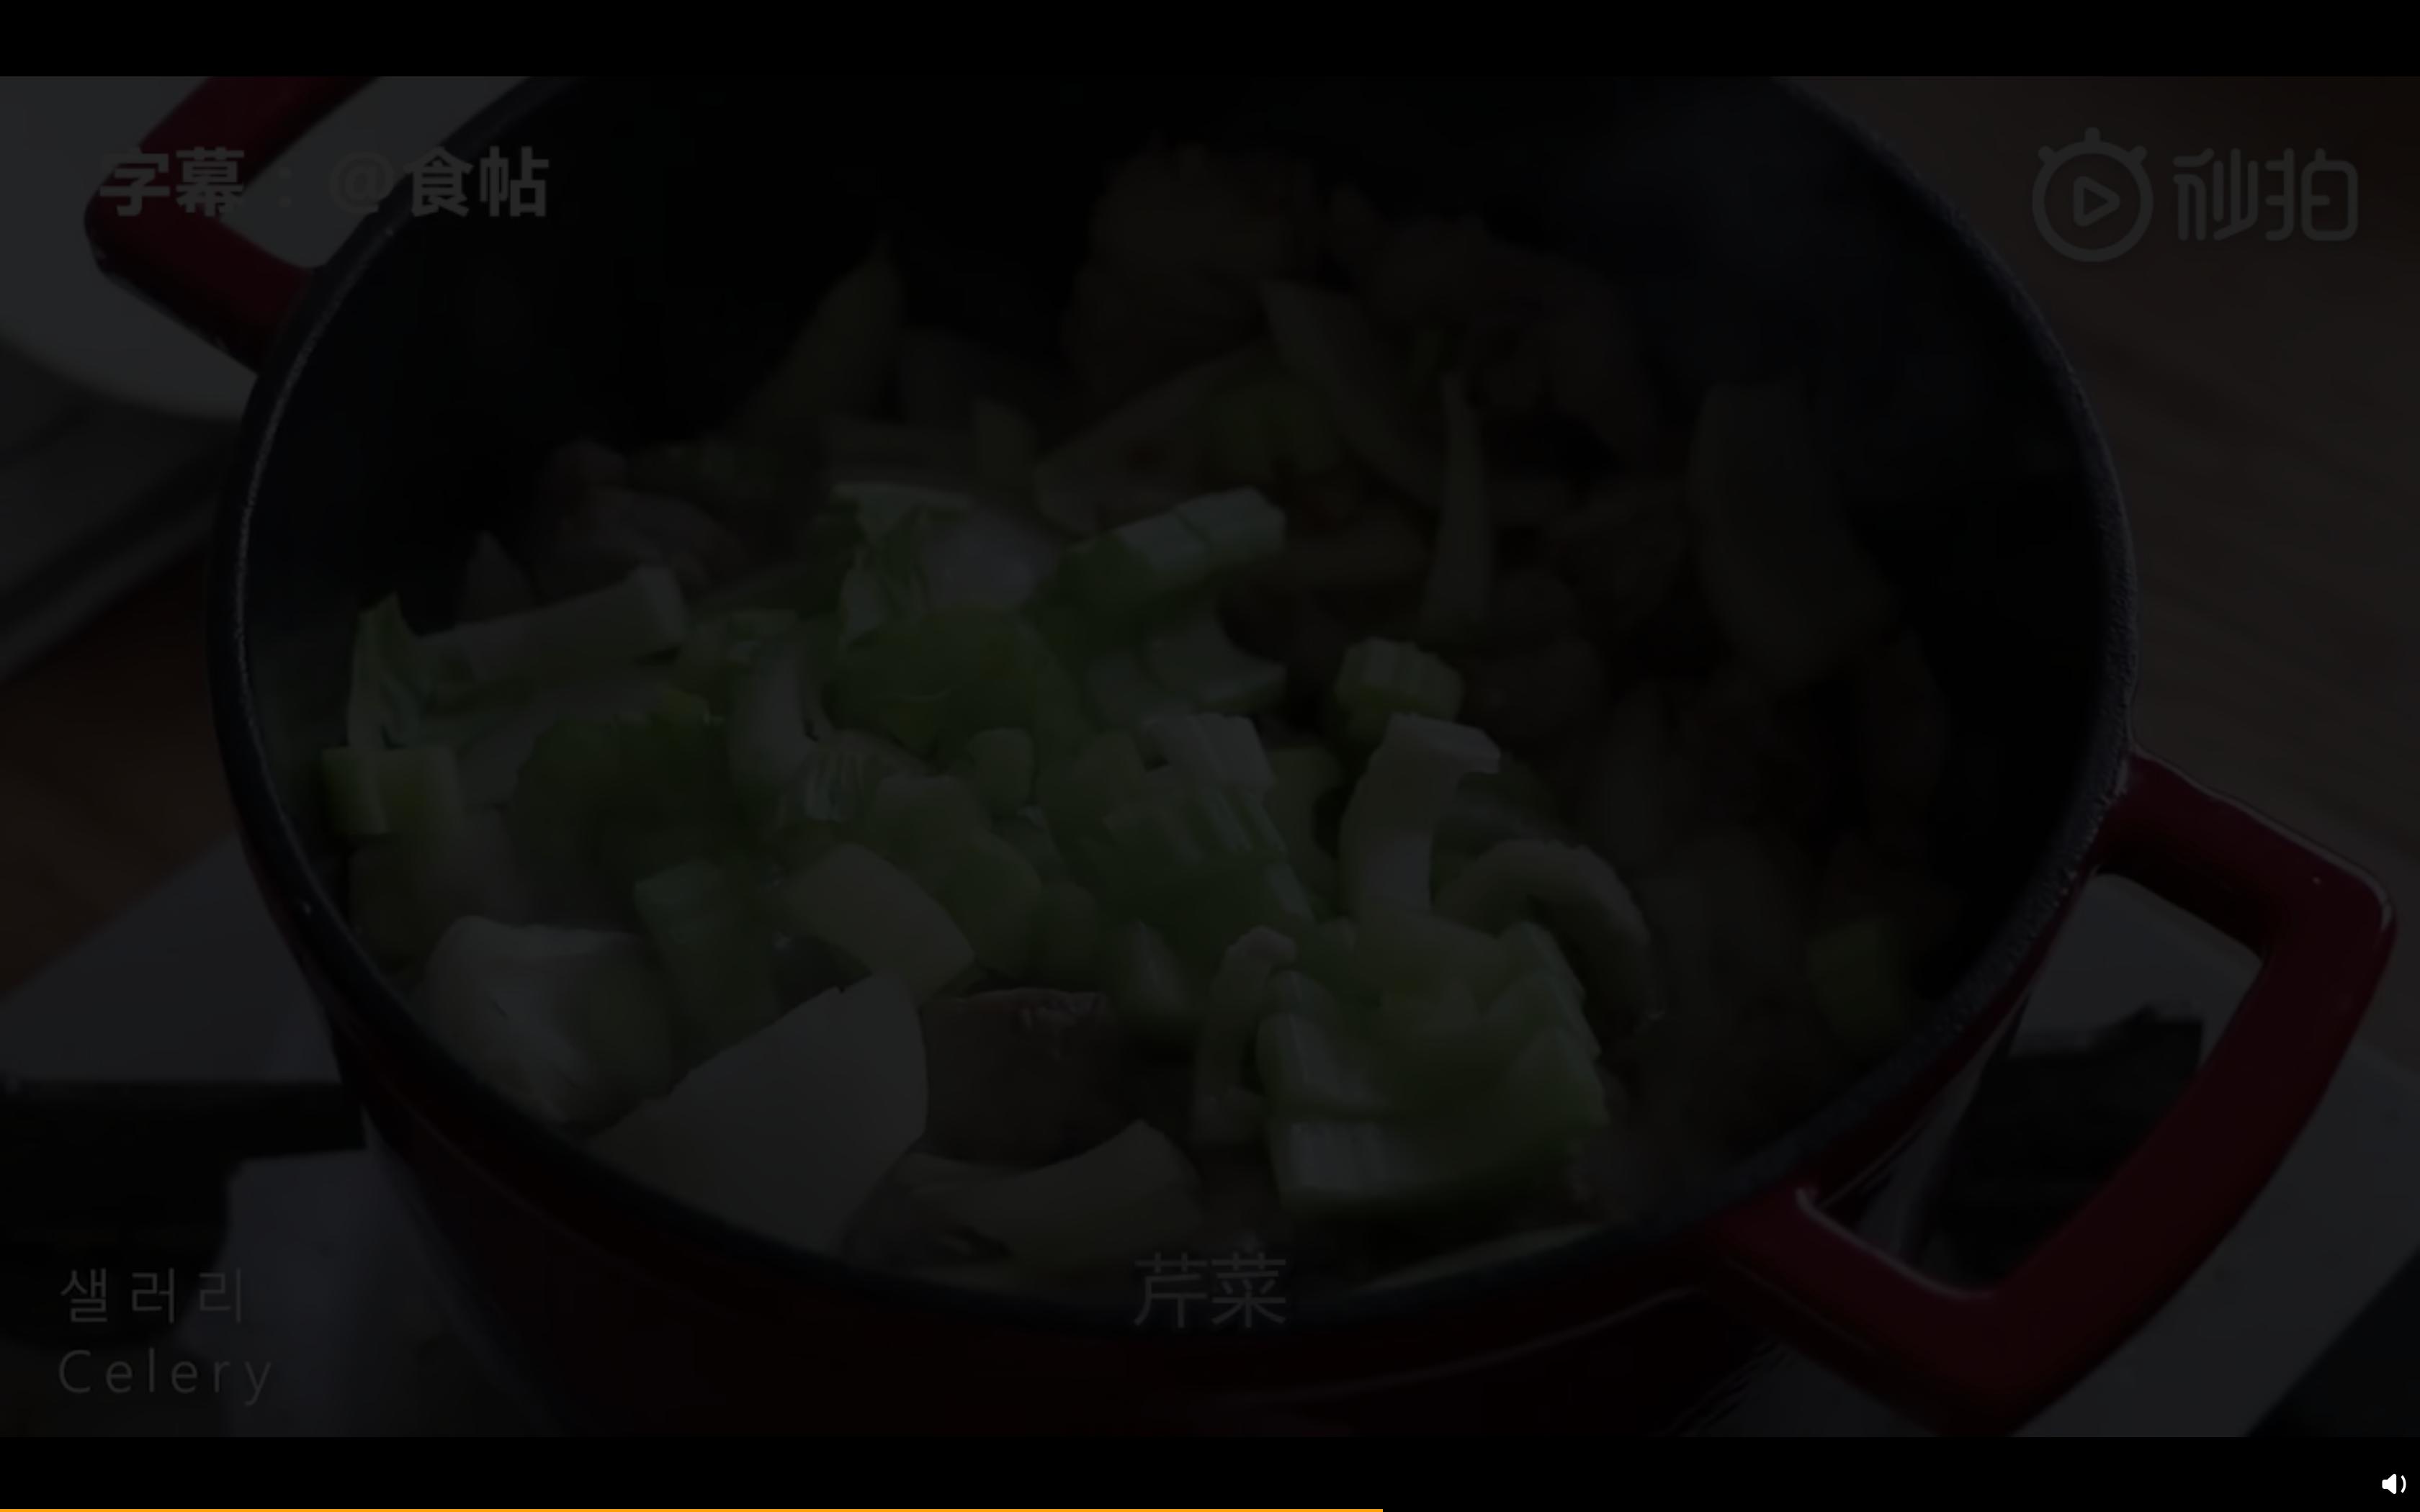 02-weibo-fullscreen.png